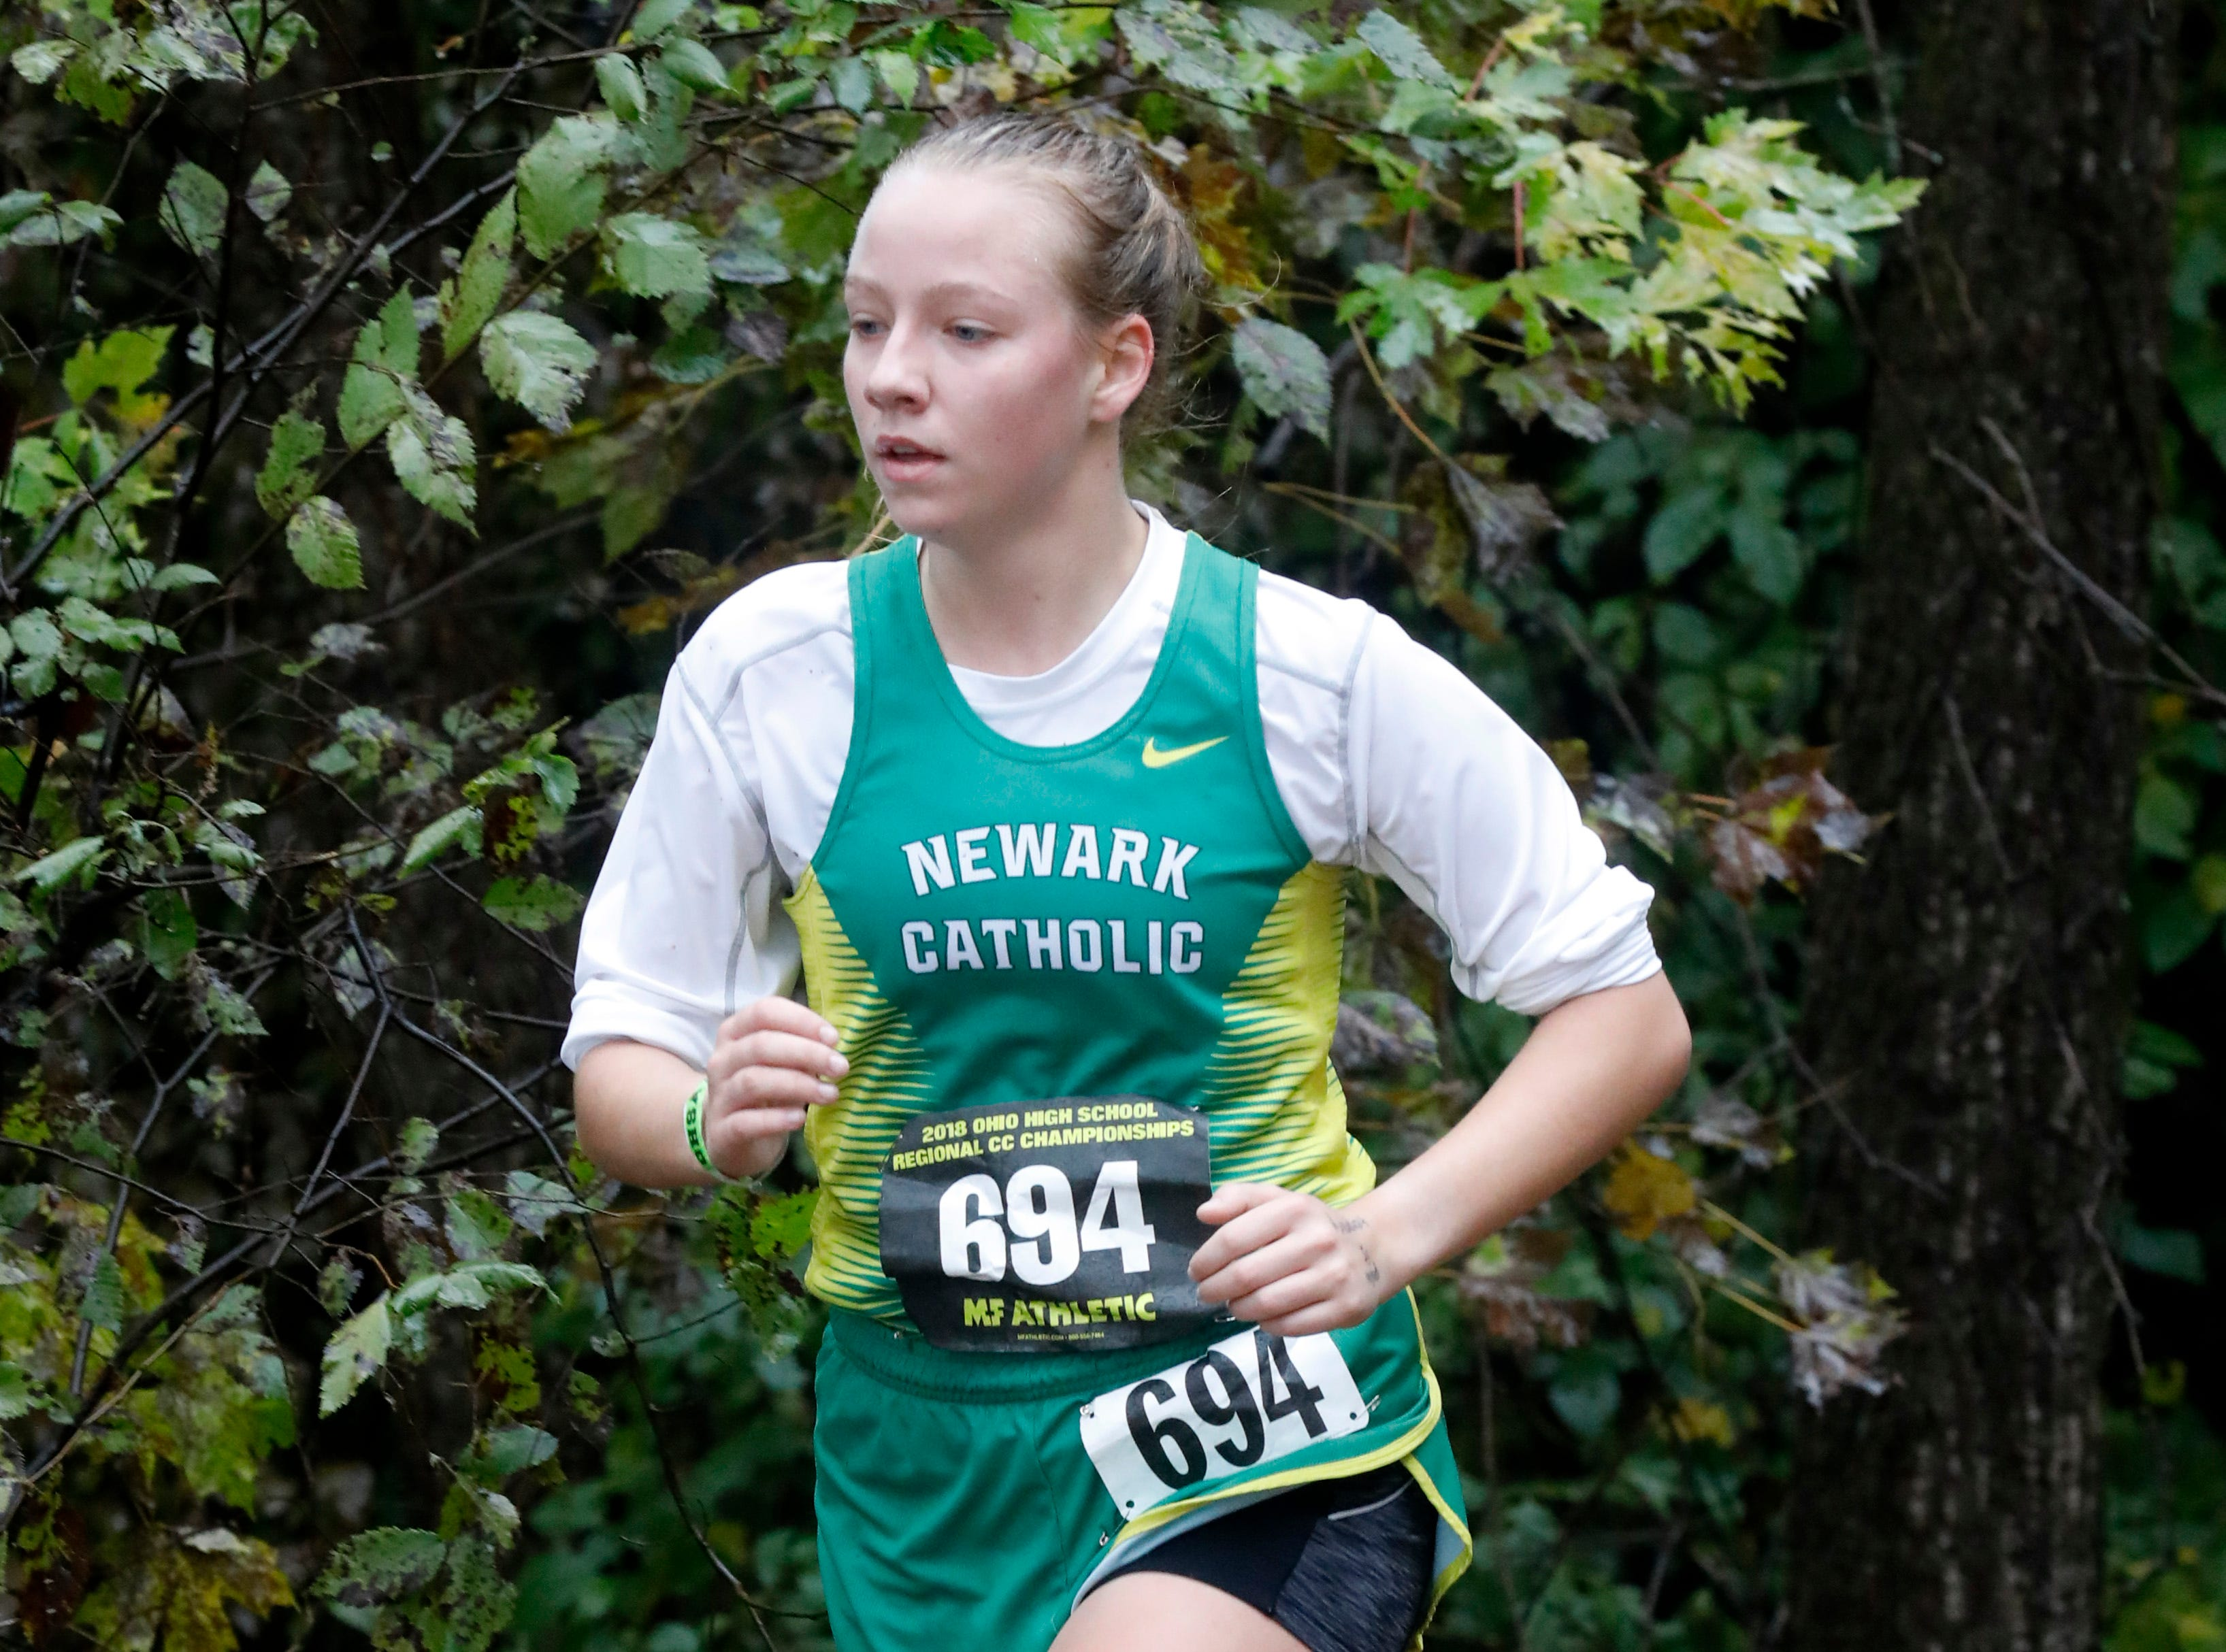 Newark Catholic's Daryle Howard runs in the Regional Cross Country meet Saturday, Oct. 27, 2018, at Pickerington North High School in Pickerington.